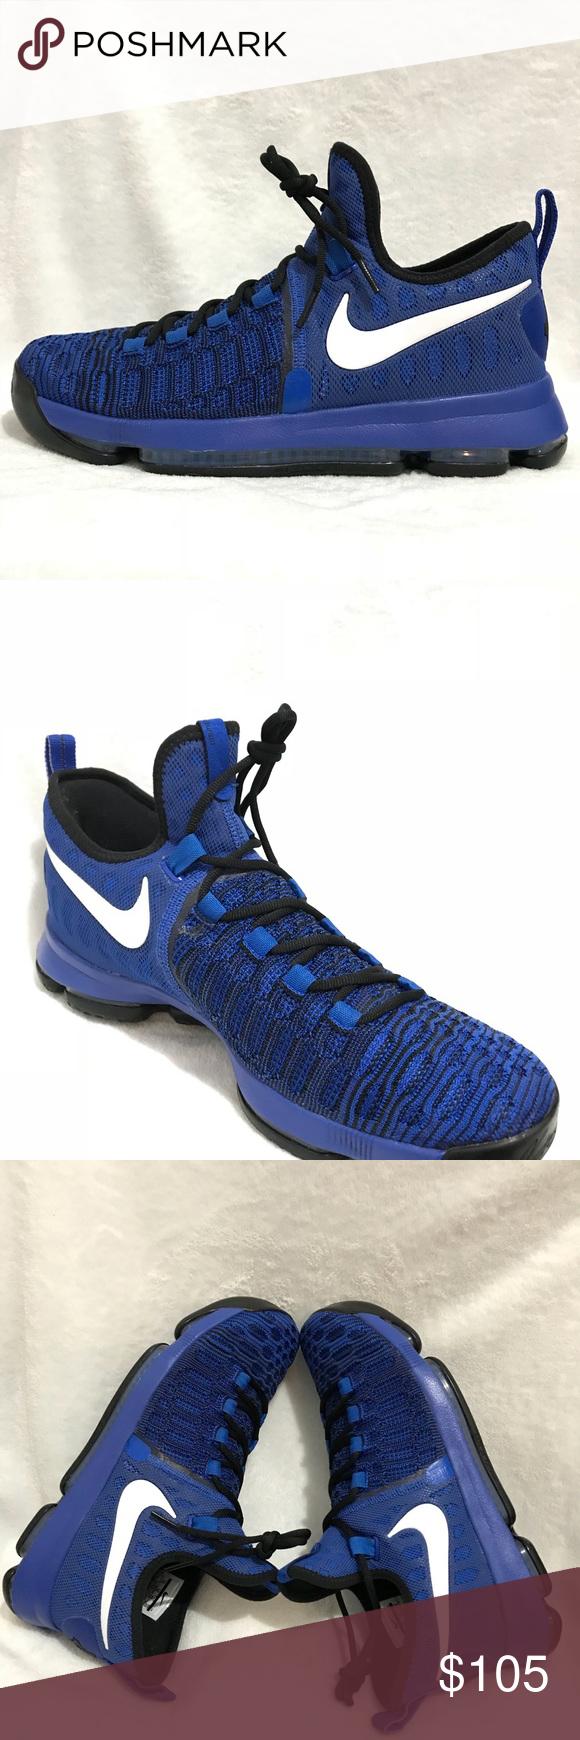 sale retailer d7b78 db128 Nike Zoom KD 9